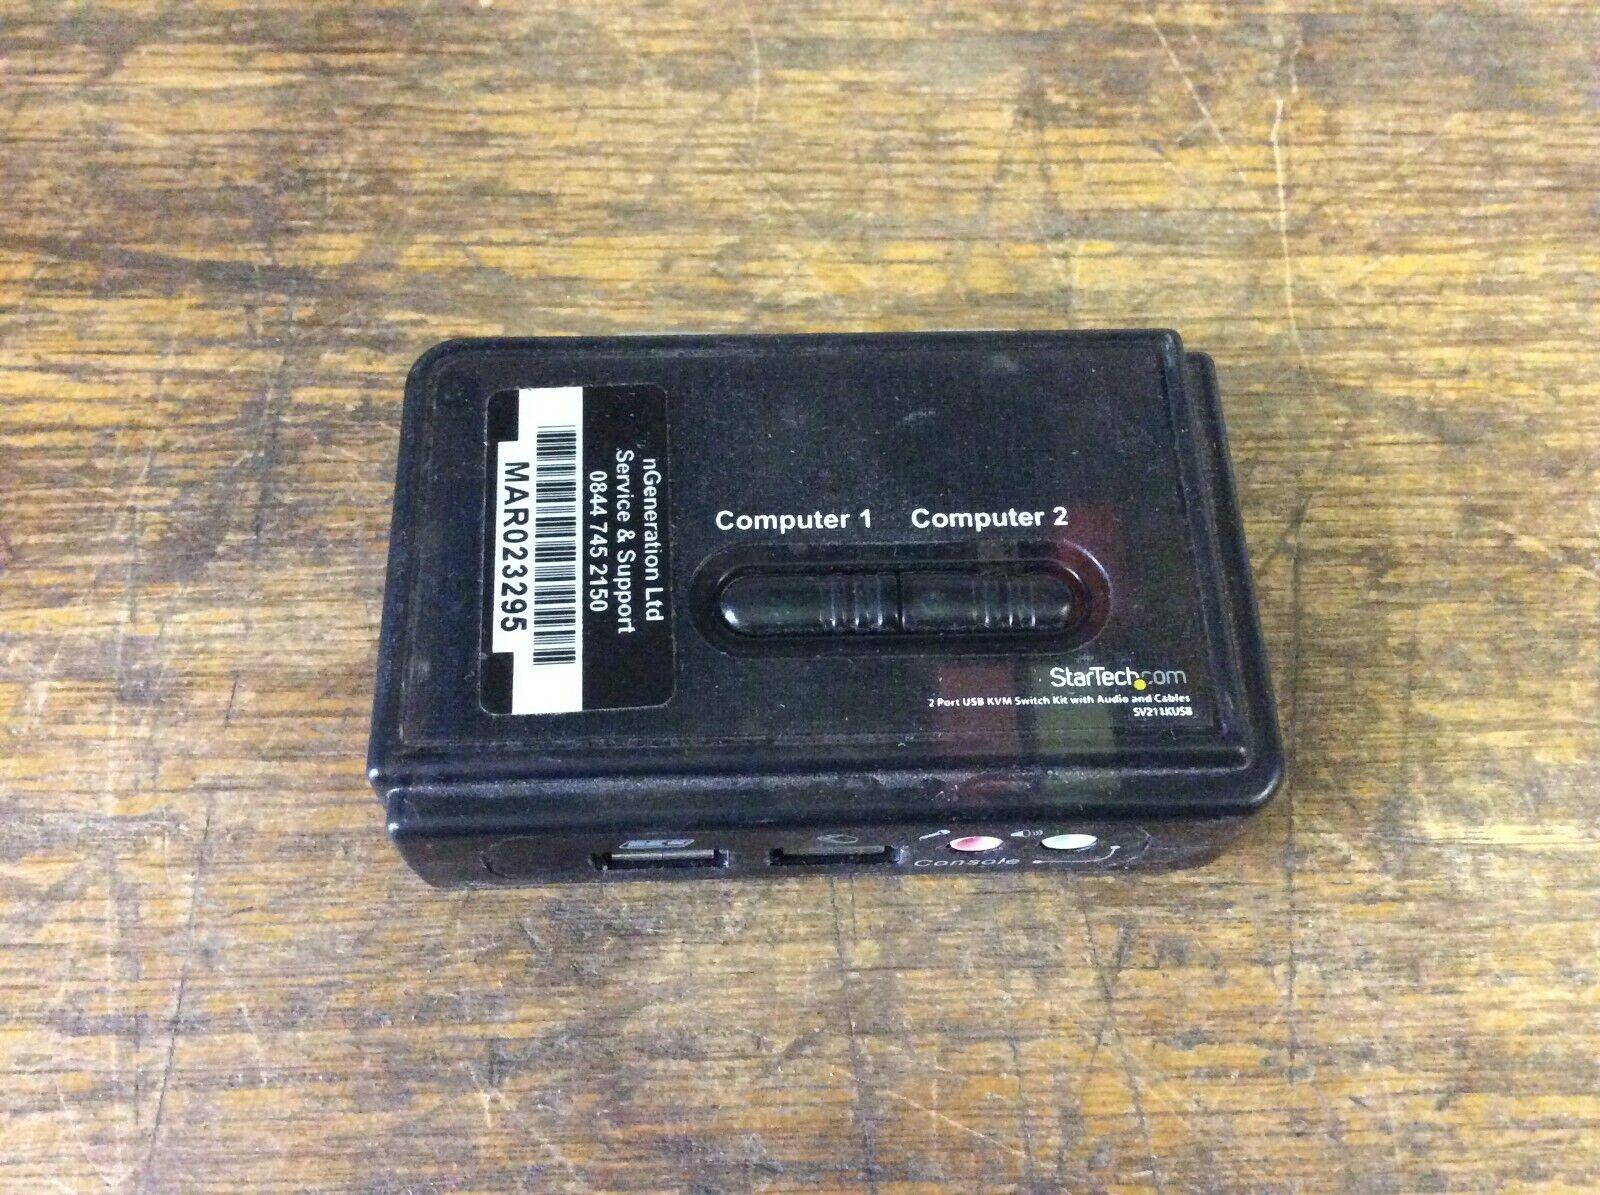 STARTECH SV211KUSB 2 PORT USB KVM SWITCH KIT 39041 B18 I5S3